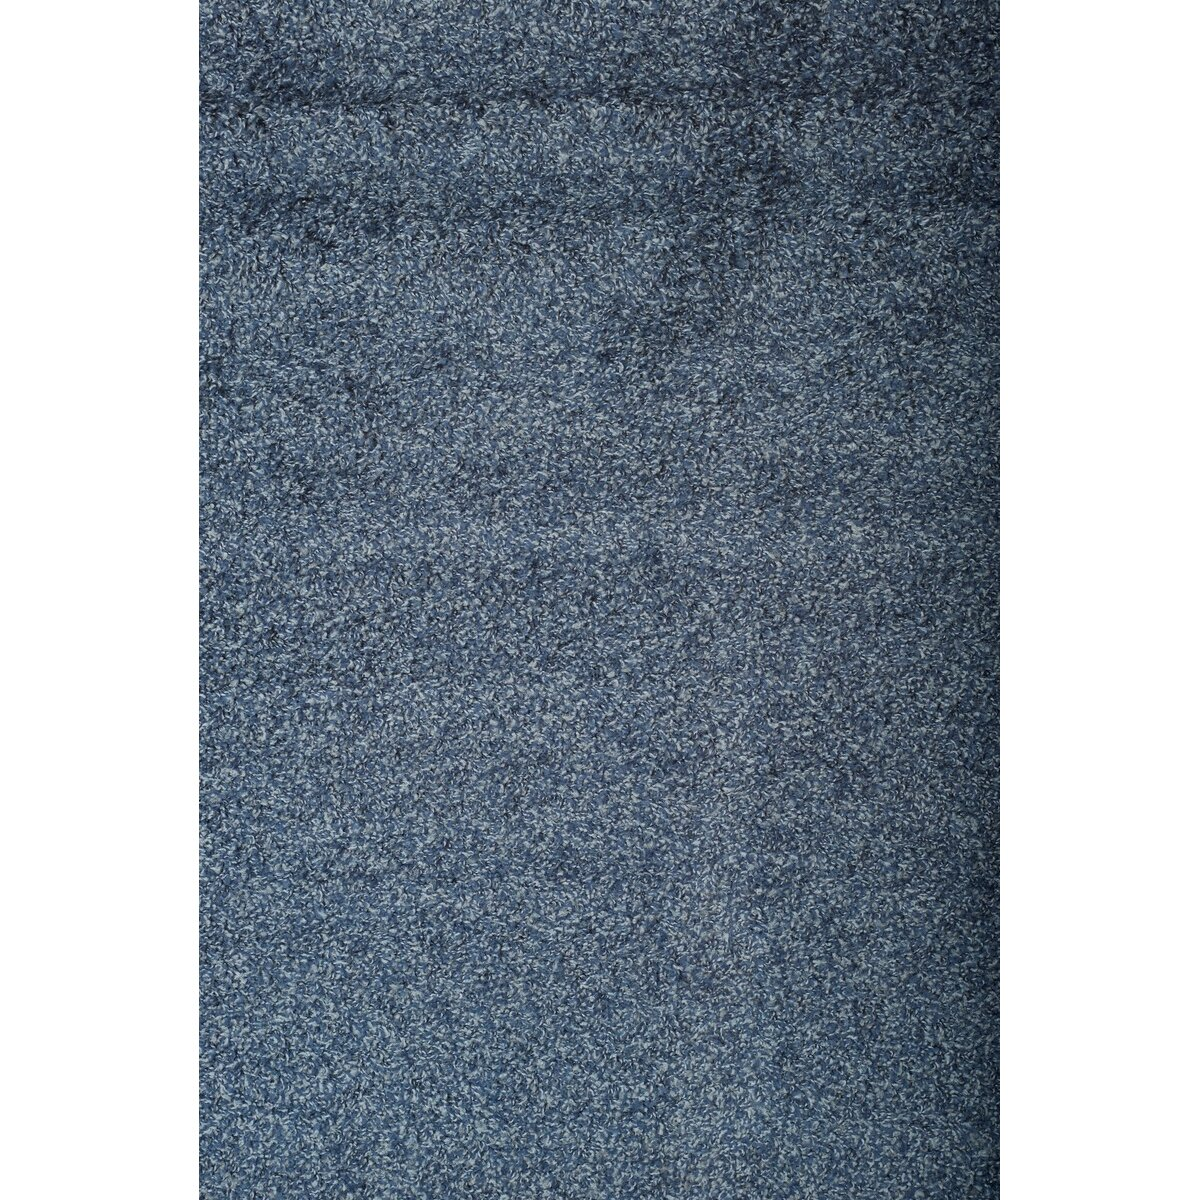 Abacasa domino blue area rug wayfair for Living room rugs 8 x 10